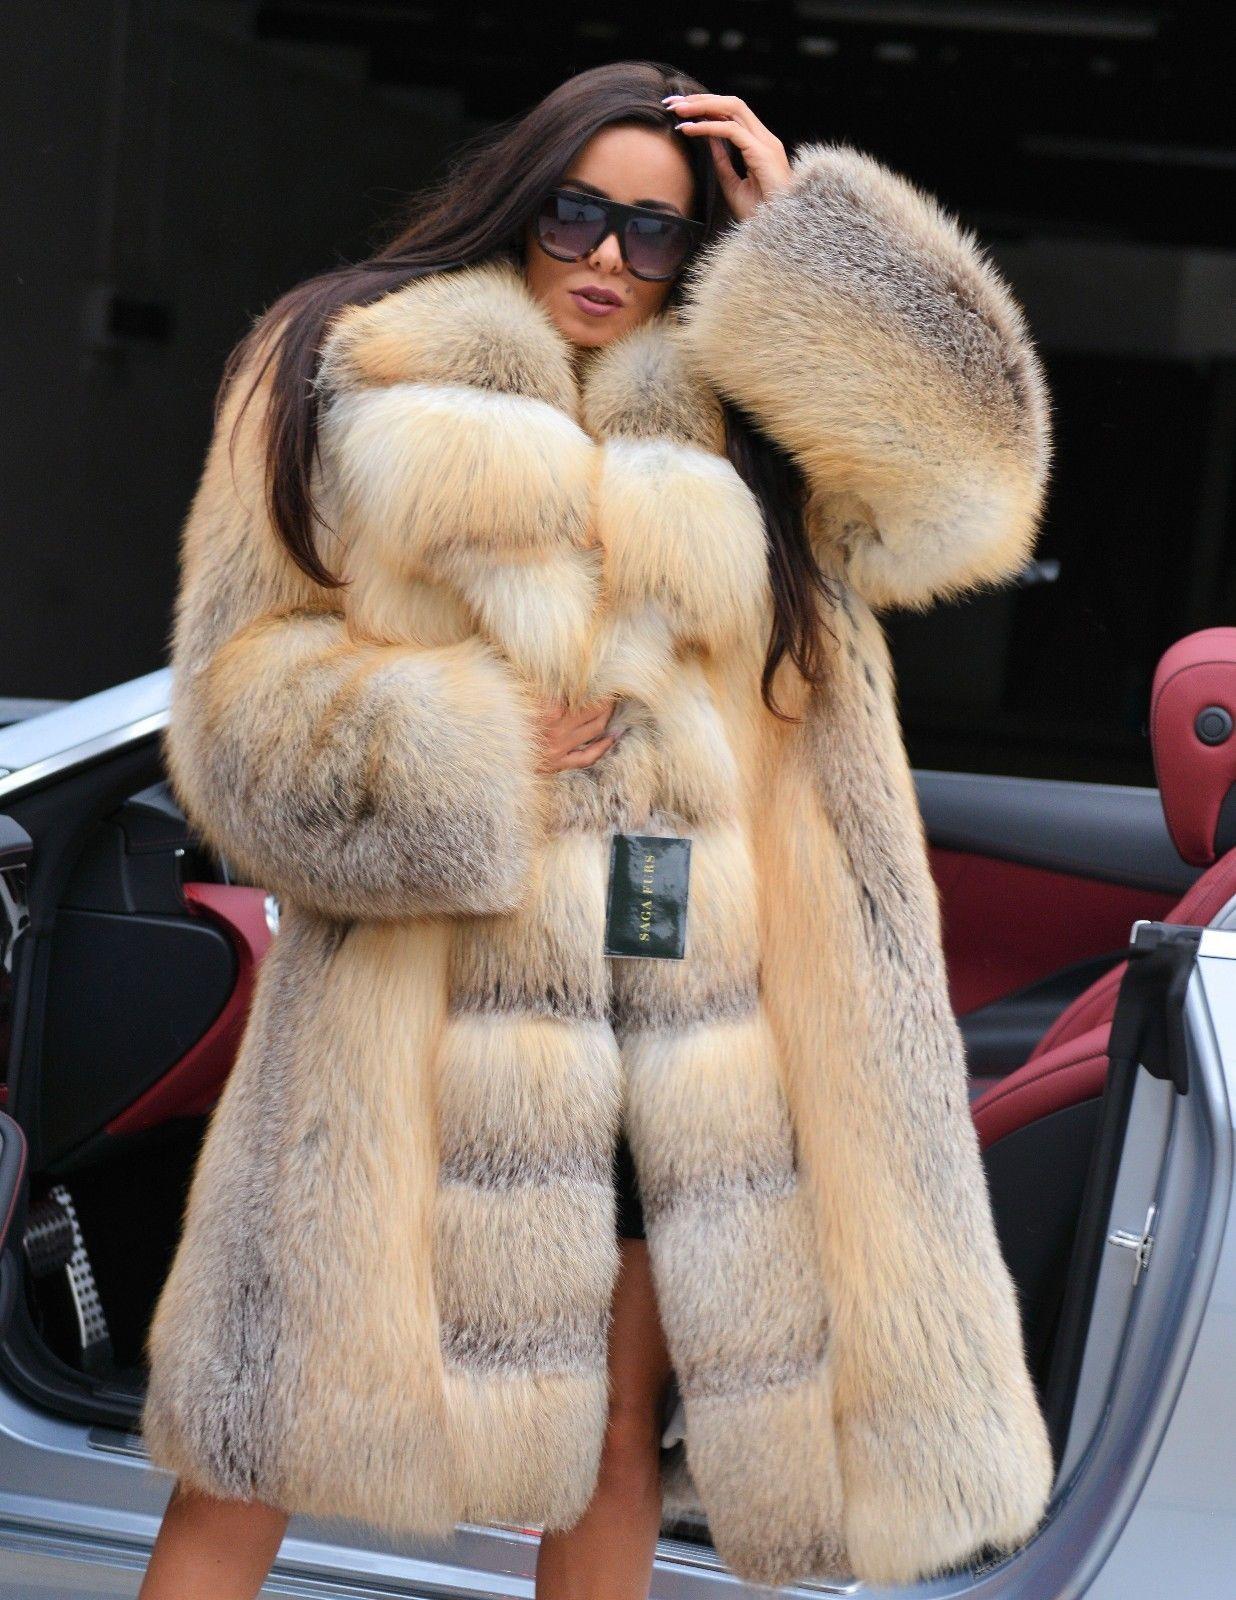 2017 Golden Island Royal Fox Fur Coat Class Chinchilla Sable Mink Silver Jacket In Kleidung Amp Accessoires Dame Fuchspelz Mantel Fuchspelz Mantel Mit Pelz